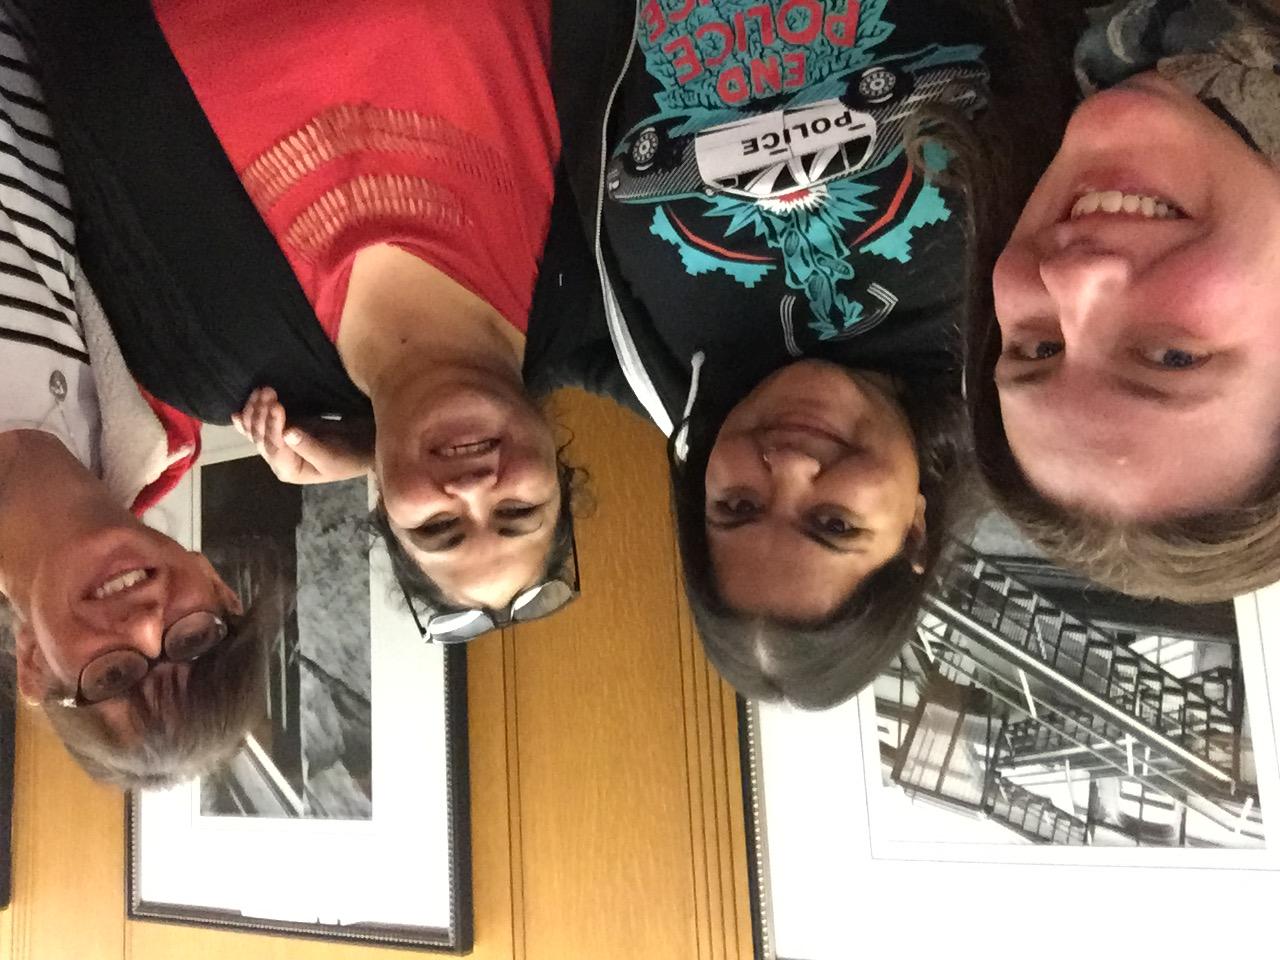 Photo, from left to right: Lyndsay Watson (Pivot), Meenakshi Mannoe (Pivot), Flora Munroe (VANDU), Fiona York (C-CAP) | (December 3rd, 2019)